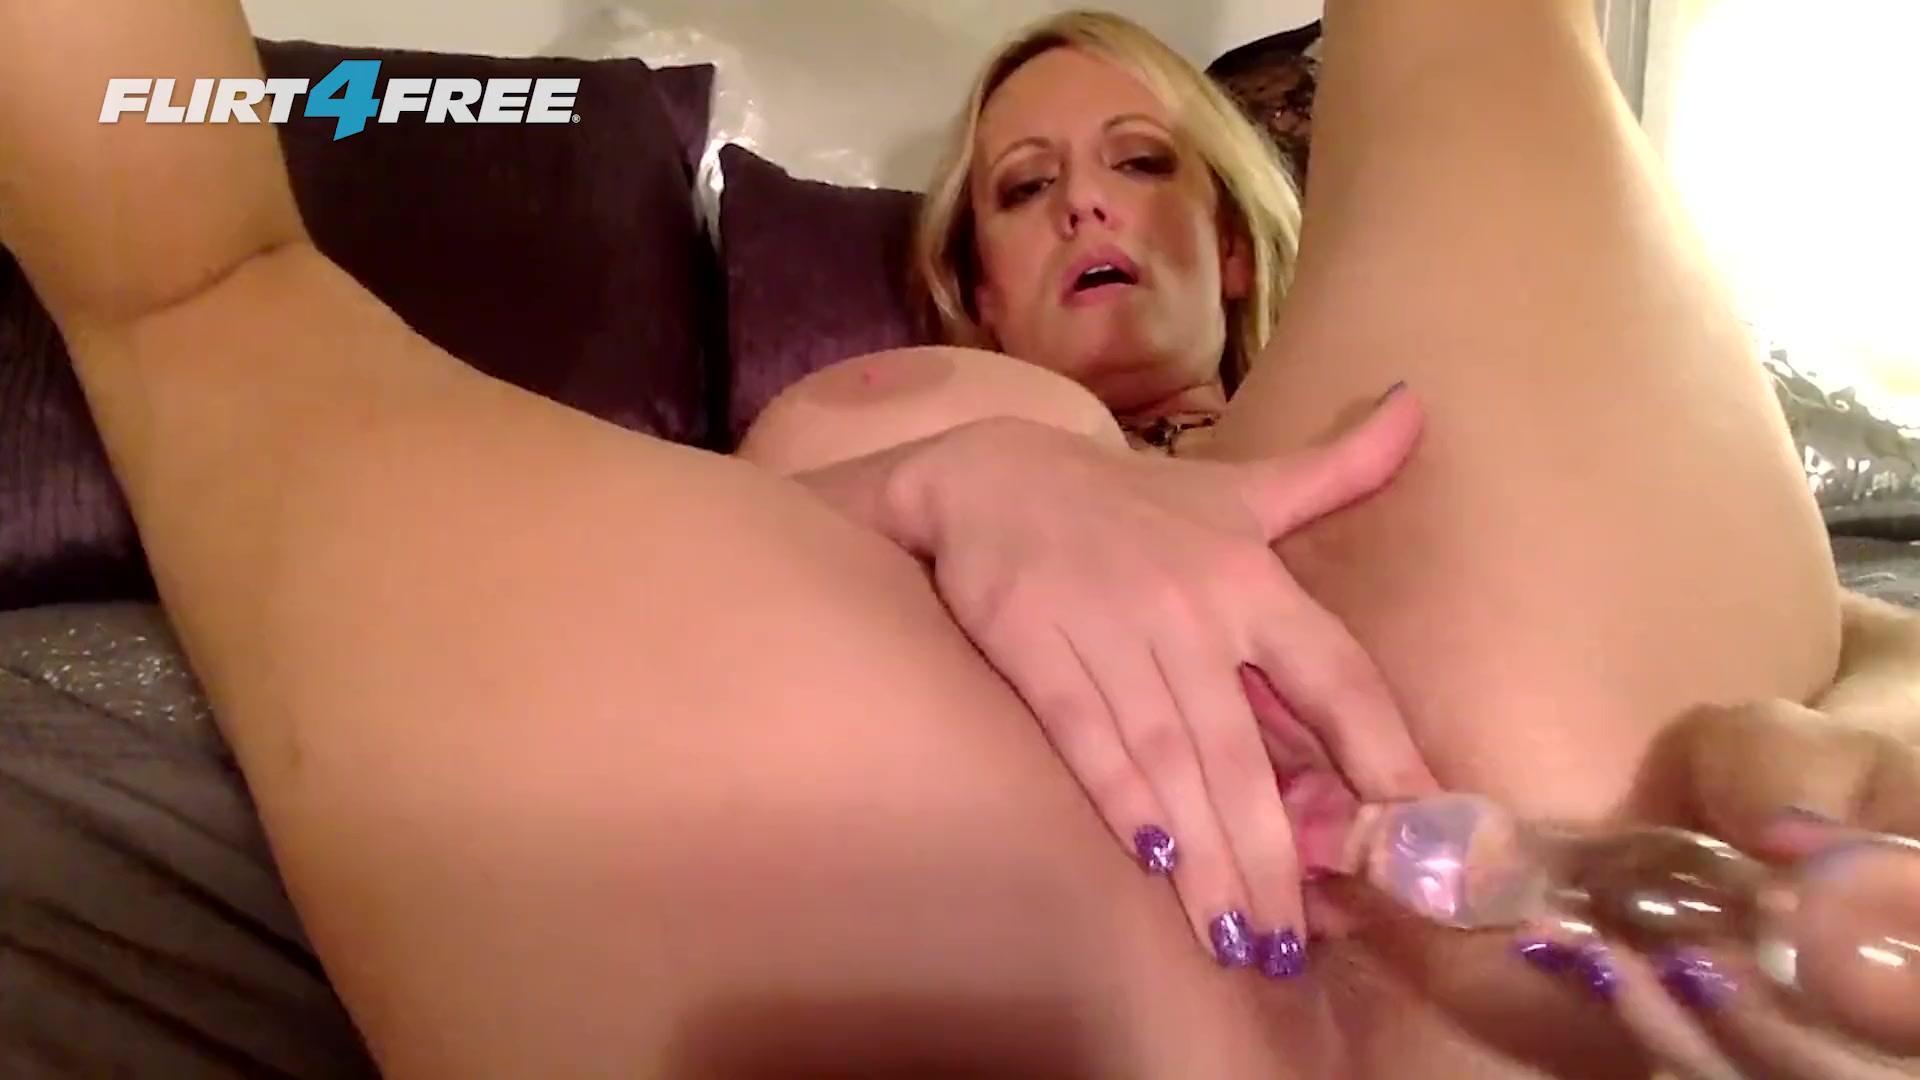 Stormy daniels anal sex